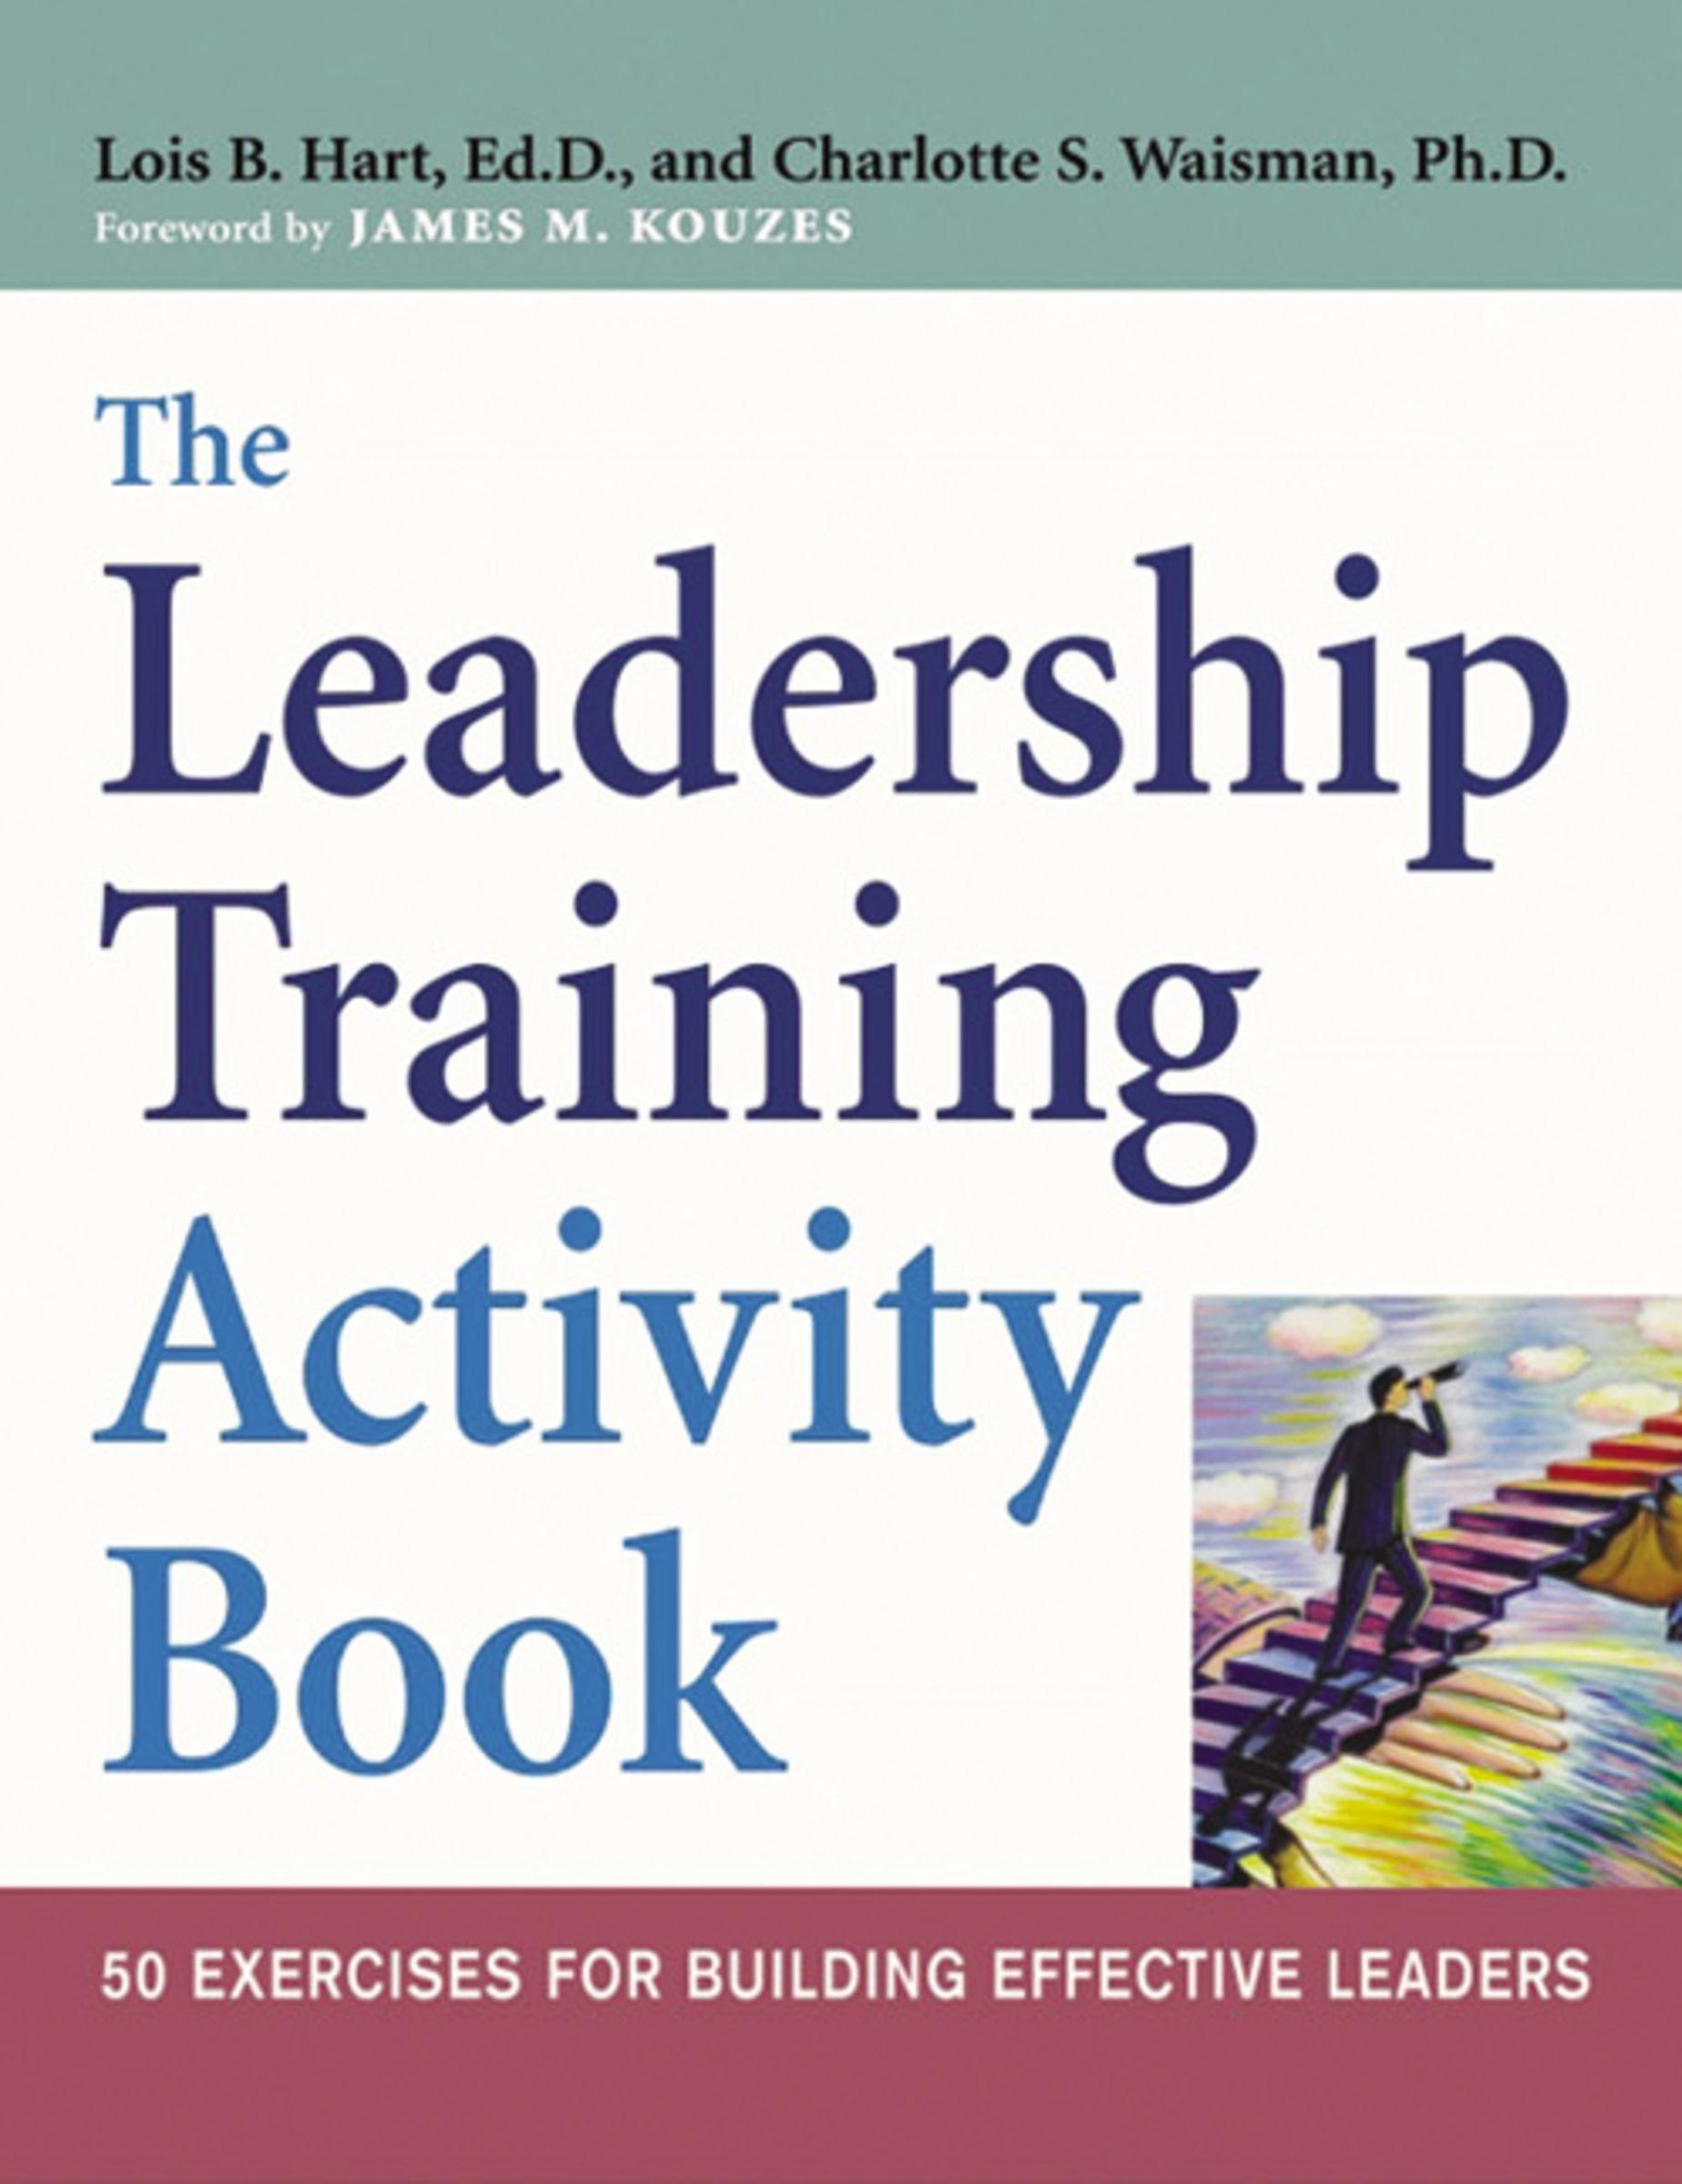 Amazon.com: The Leadership Training Activity Book: 50 Exercises for  Building Effective Leaders (9780814472620): Lois B. Hart, Charlotte S.  Waisman: Books